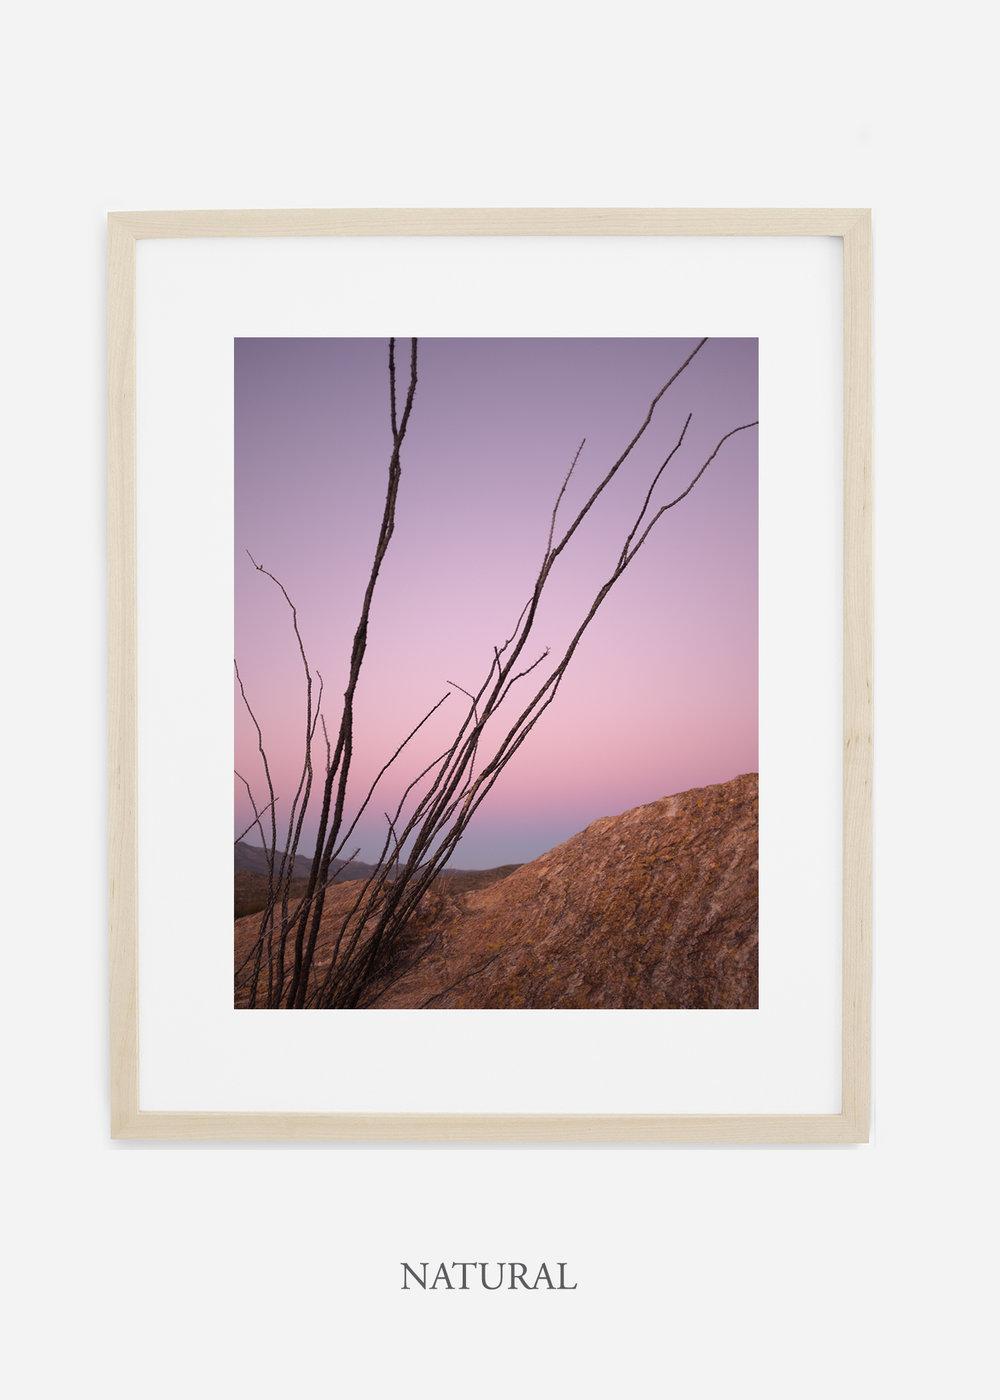 naturalframe-saguaroNo.12-wildercalifornia-art-wallart-cactusprint-homedecor-prints-arizona-botanical-artwork-interiordesign.jpg